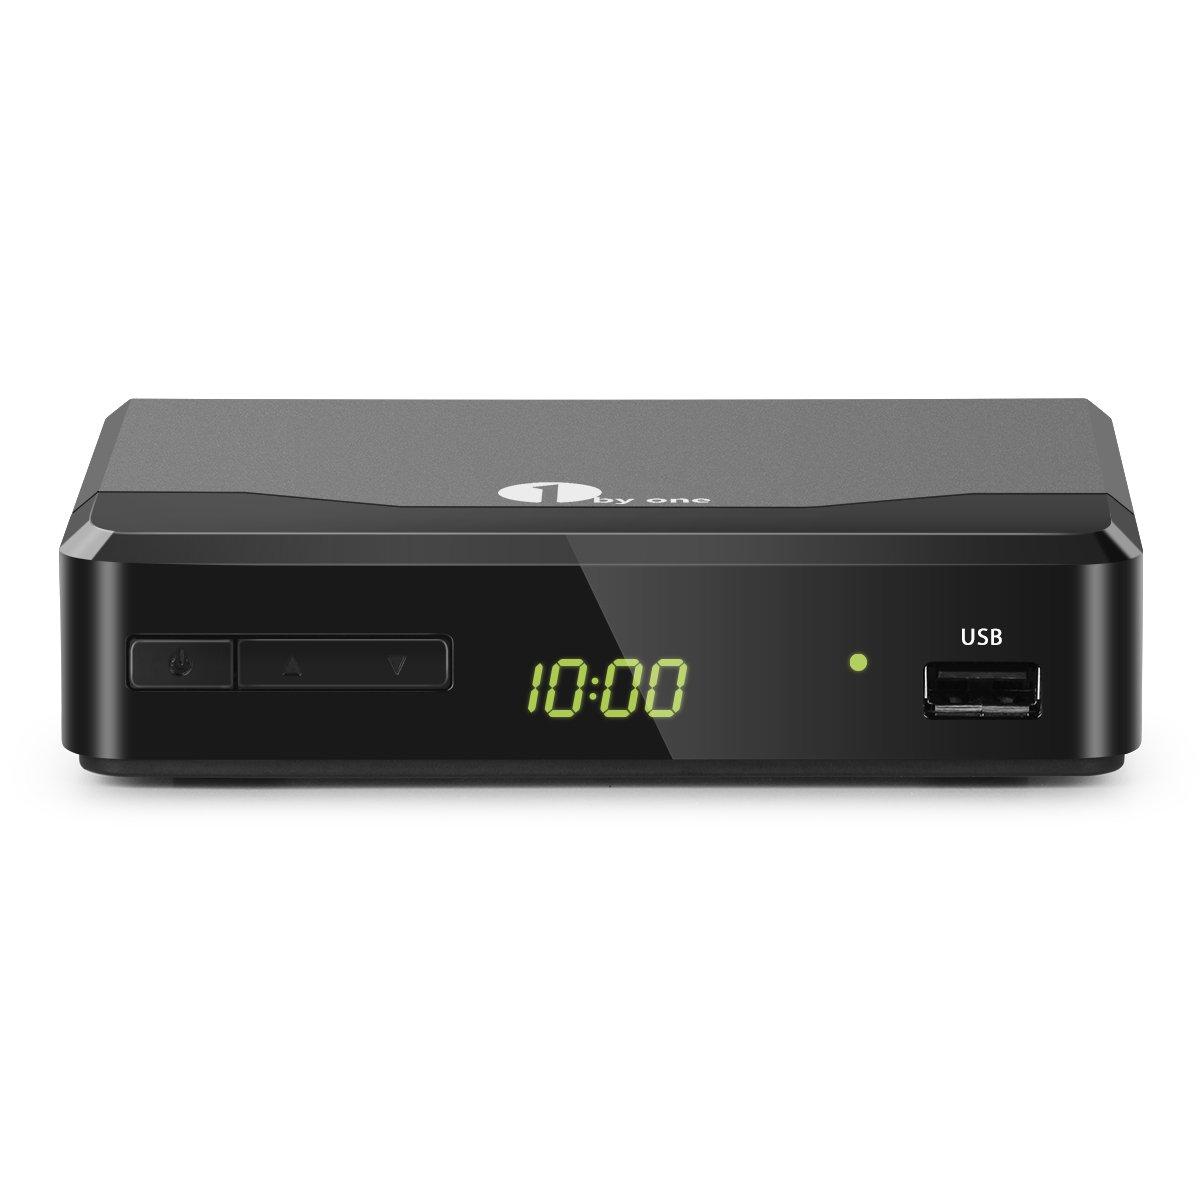 1byone ATSC Digital Converter Box for Analog TV, Analog TV Converter Box with Record and Pause Live TV, USB Multimedia Playback, HDTV Set Top Box for 1080p(New Version)-Black